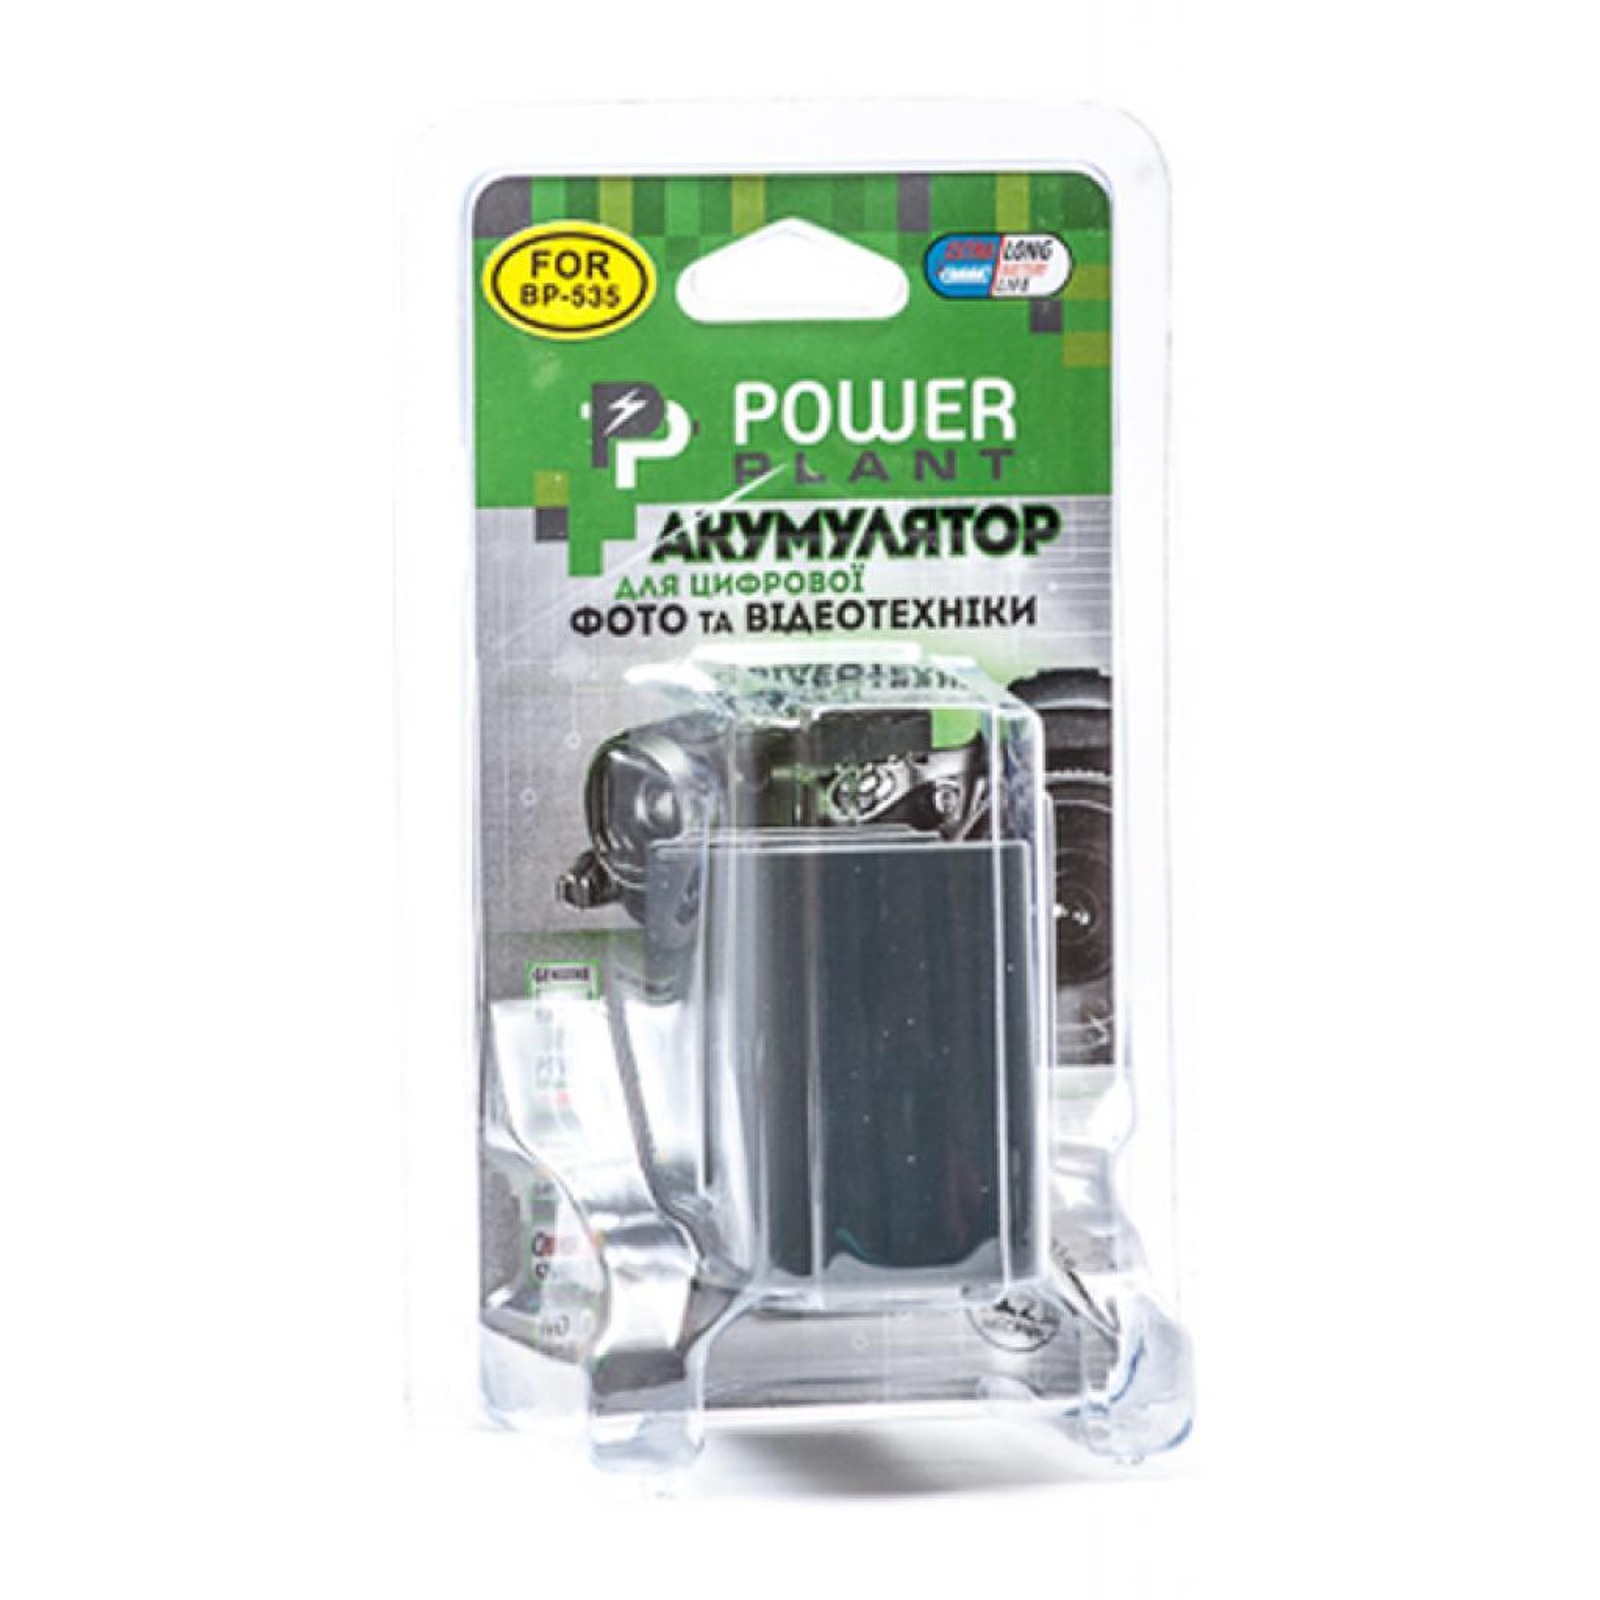 Аккумулятор к фото/видео PowerPlant Canon BP-535 (DV00DV1013) изображение 3